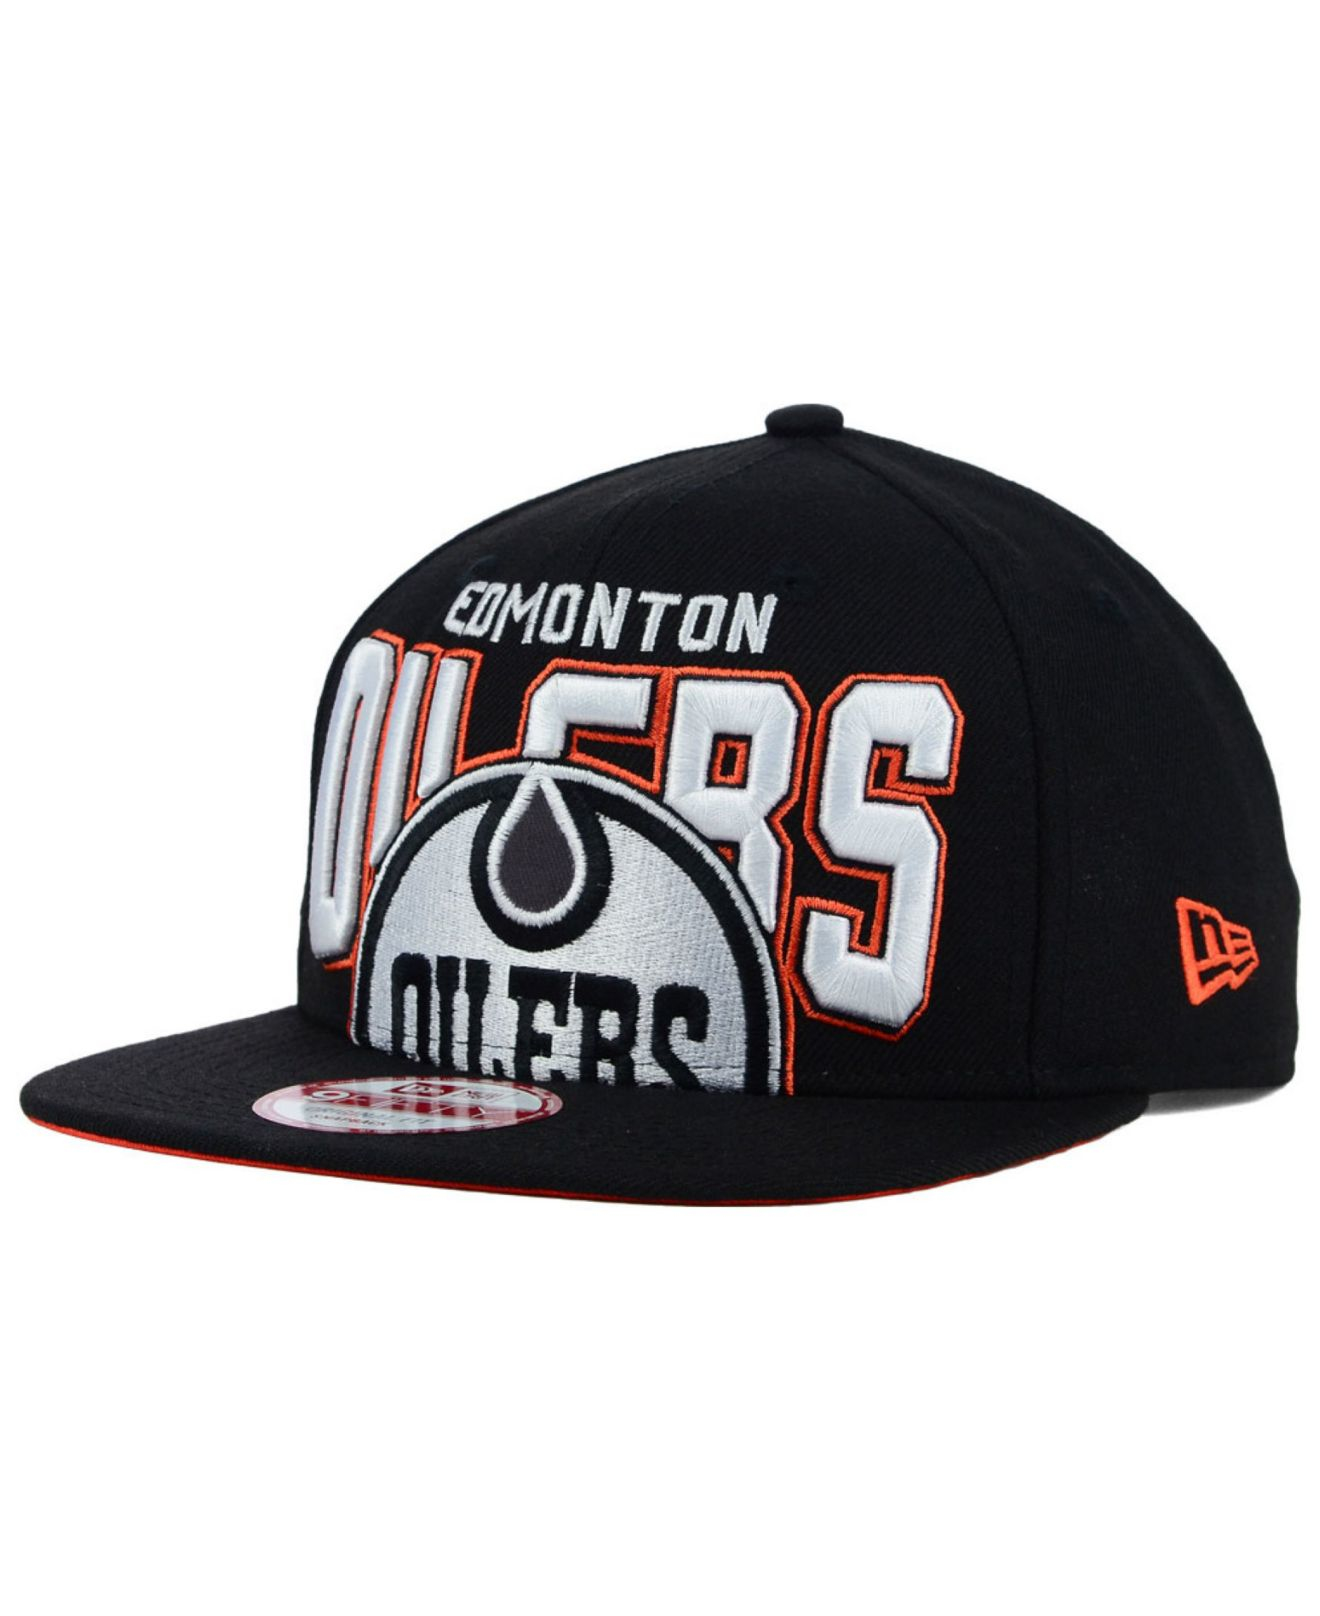 online retailer 4b0b2 5b036 Lyst - KTZ Edmonton Oilers Bold Statement 9fifty Cap in Black for Men